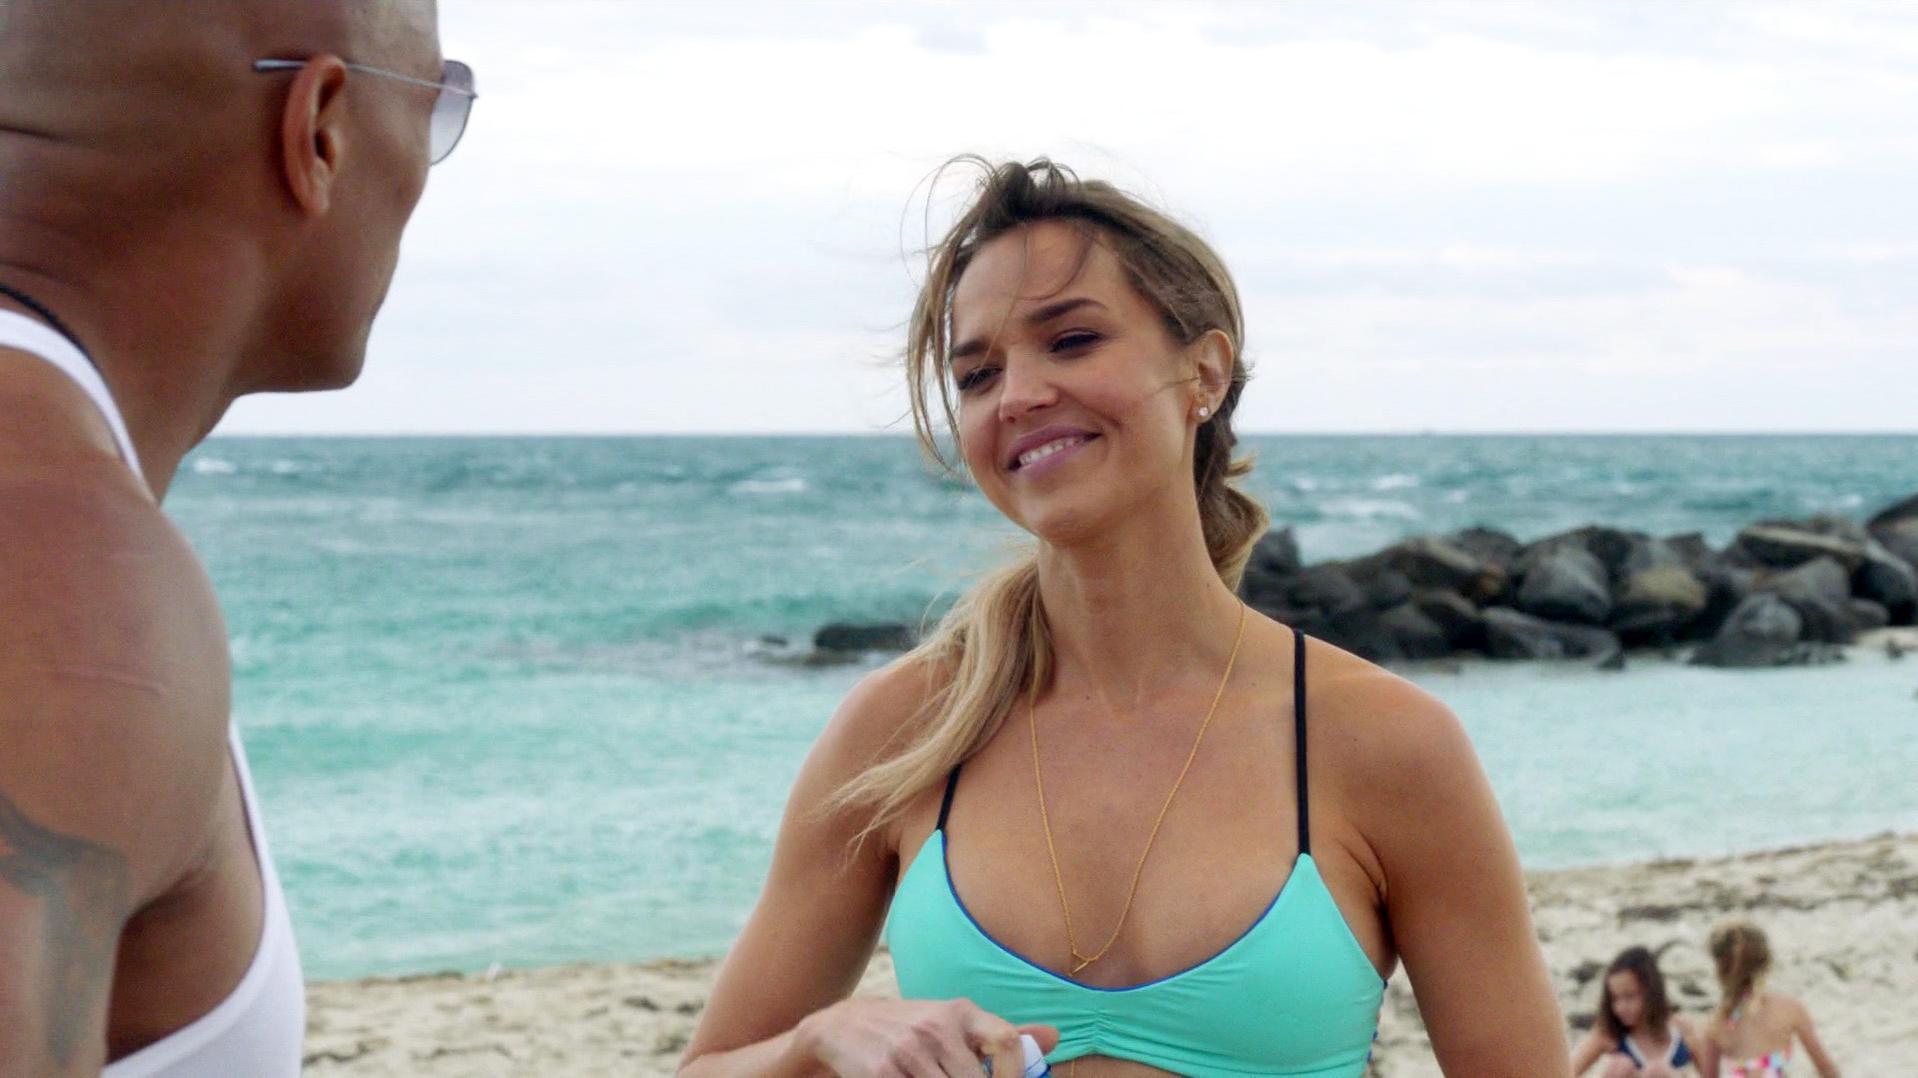 Arielle Kebbel sexy, Joy Corrigan nude, Staci Lyon nude - Ballers s01e06-07 (2015)